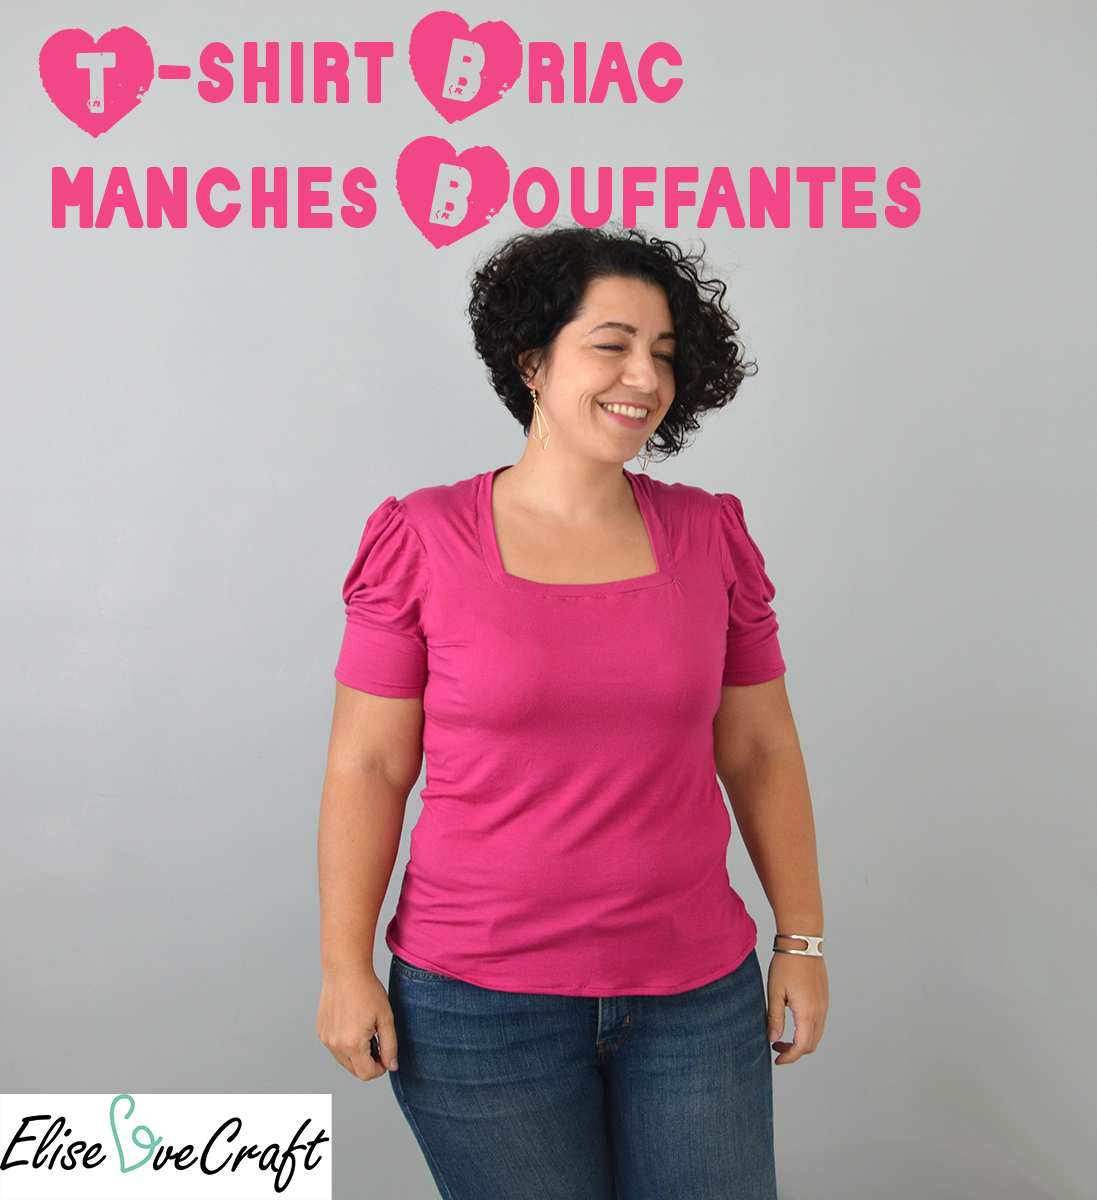 t-shirt Briac manches bouffantes Pin It